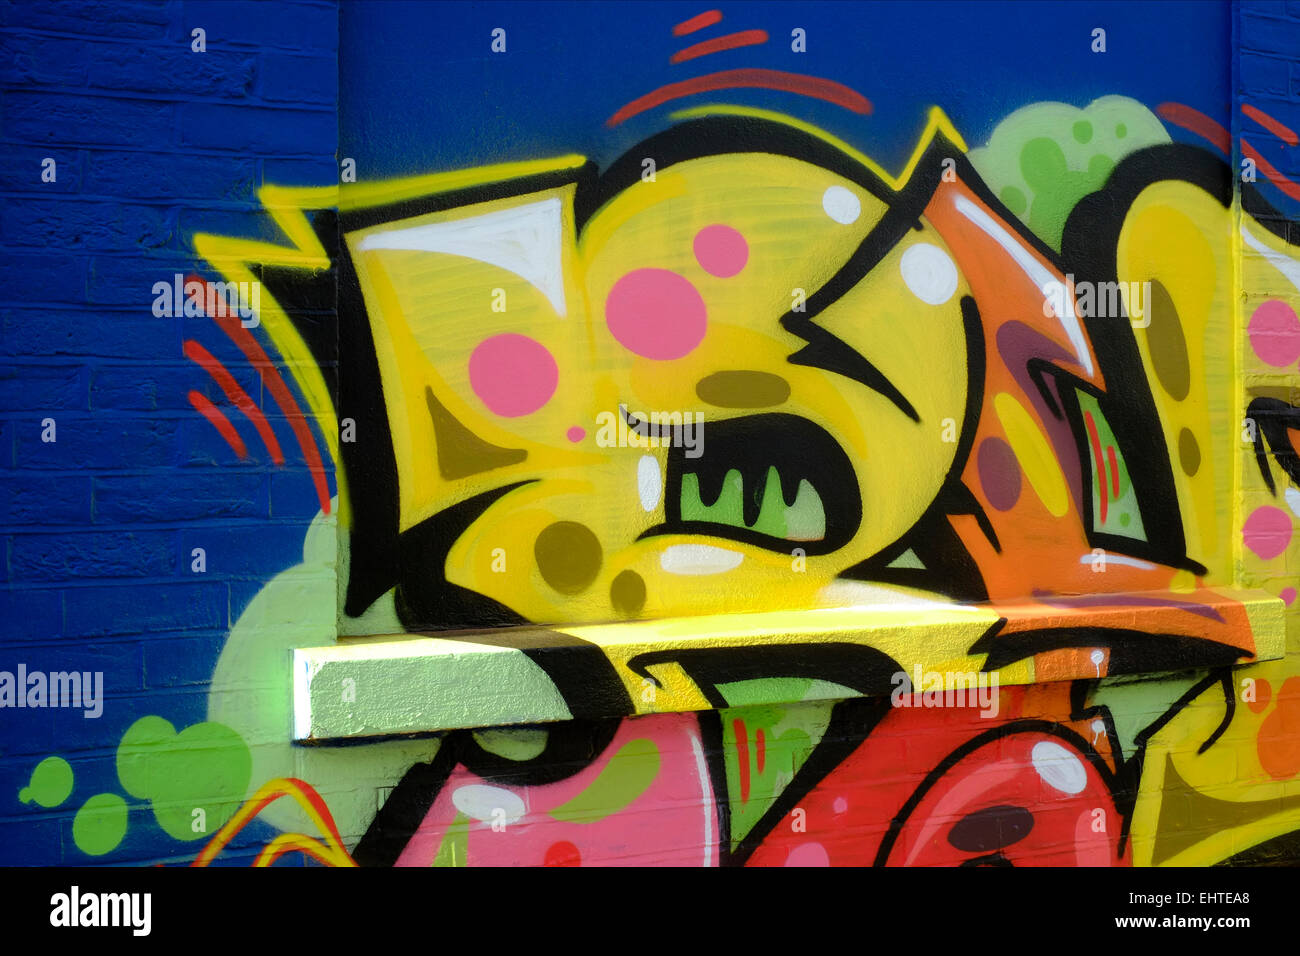 Pretty Spray Paint Wall Art Contemporary - Wall Art Ideas - dochista ...